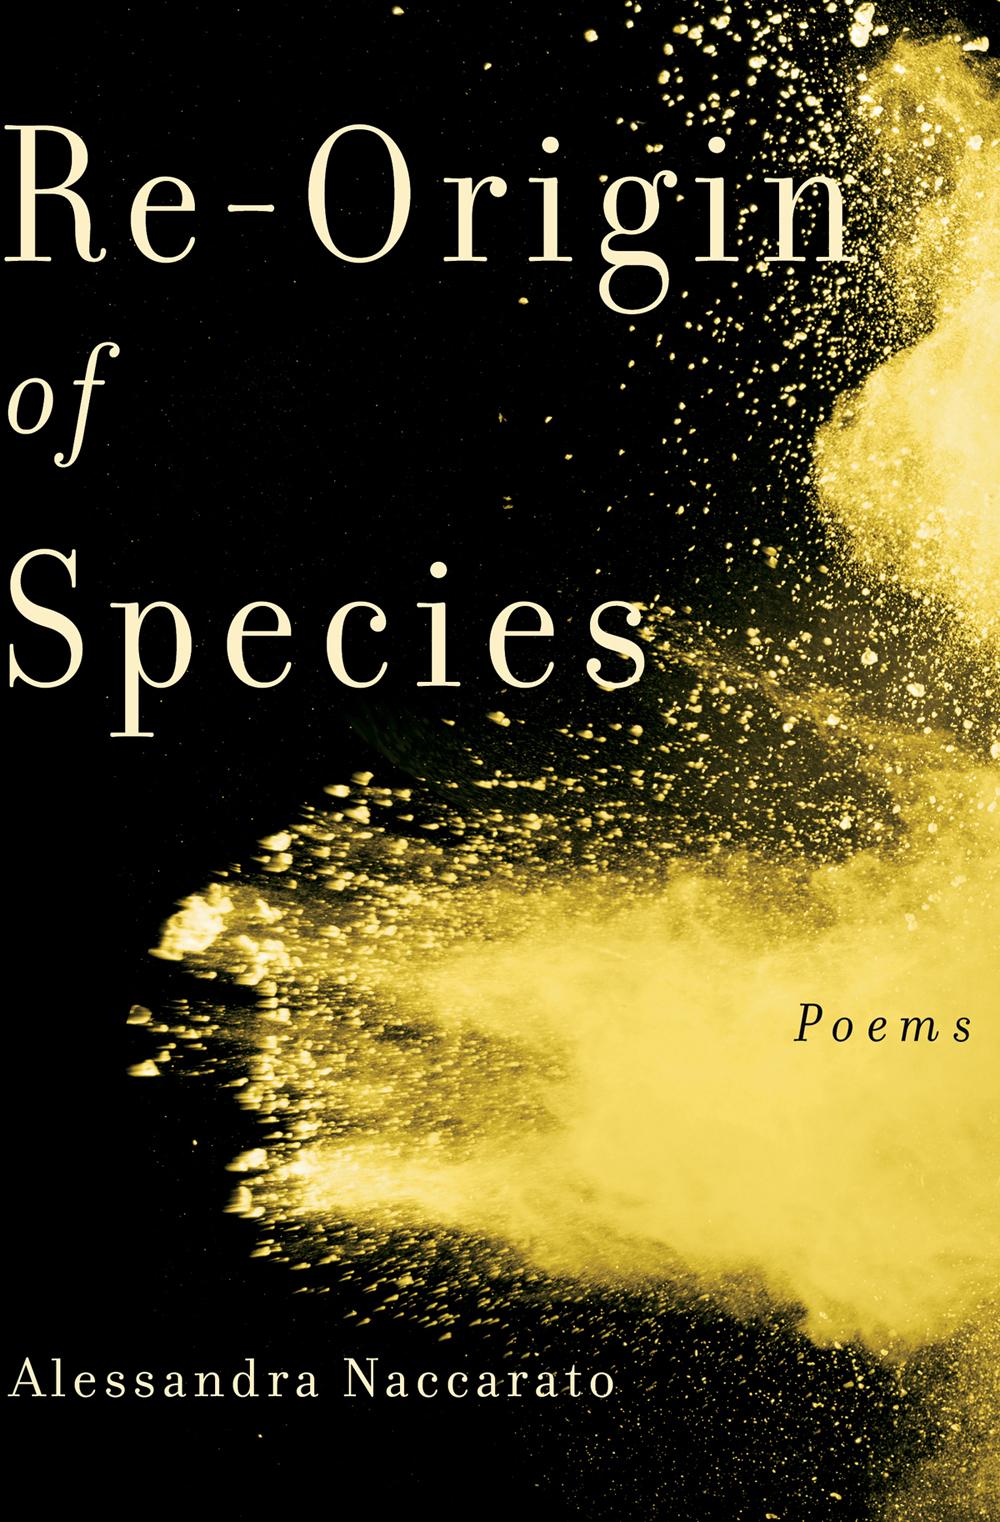 Re-Origin of Species (Book*hug, 2019) By Alessandra Naccarato